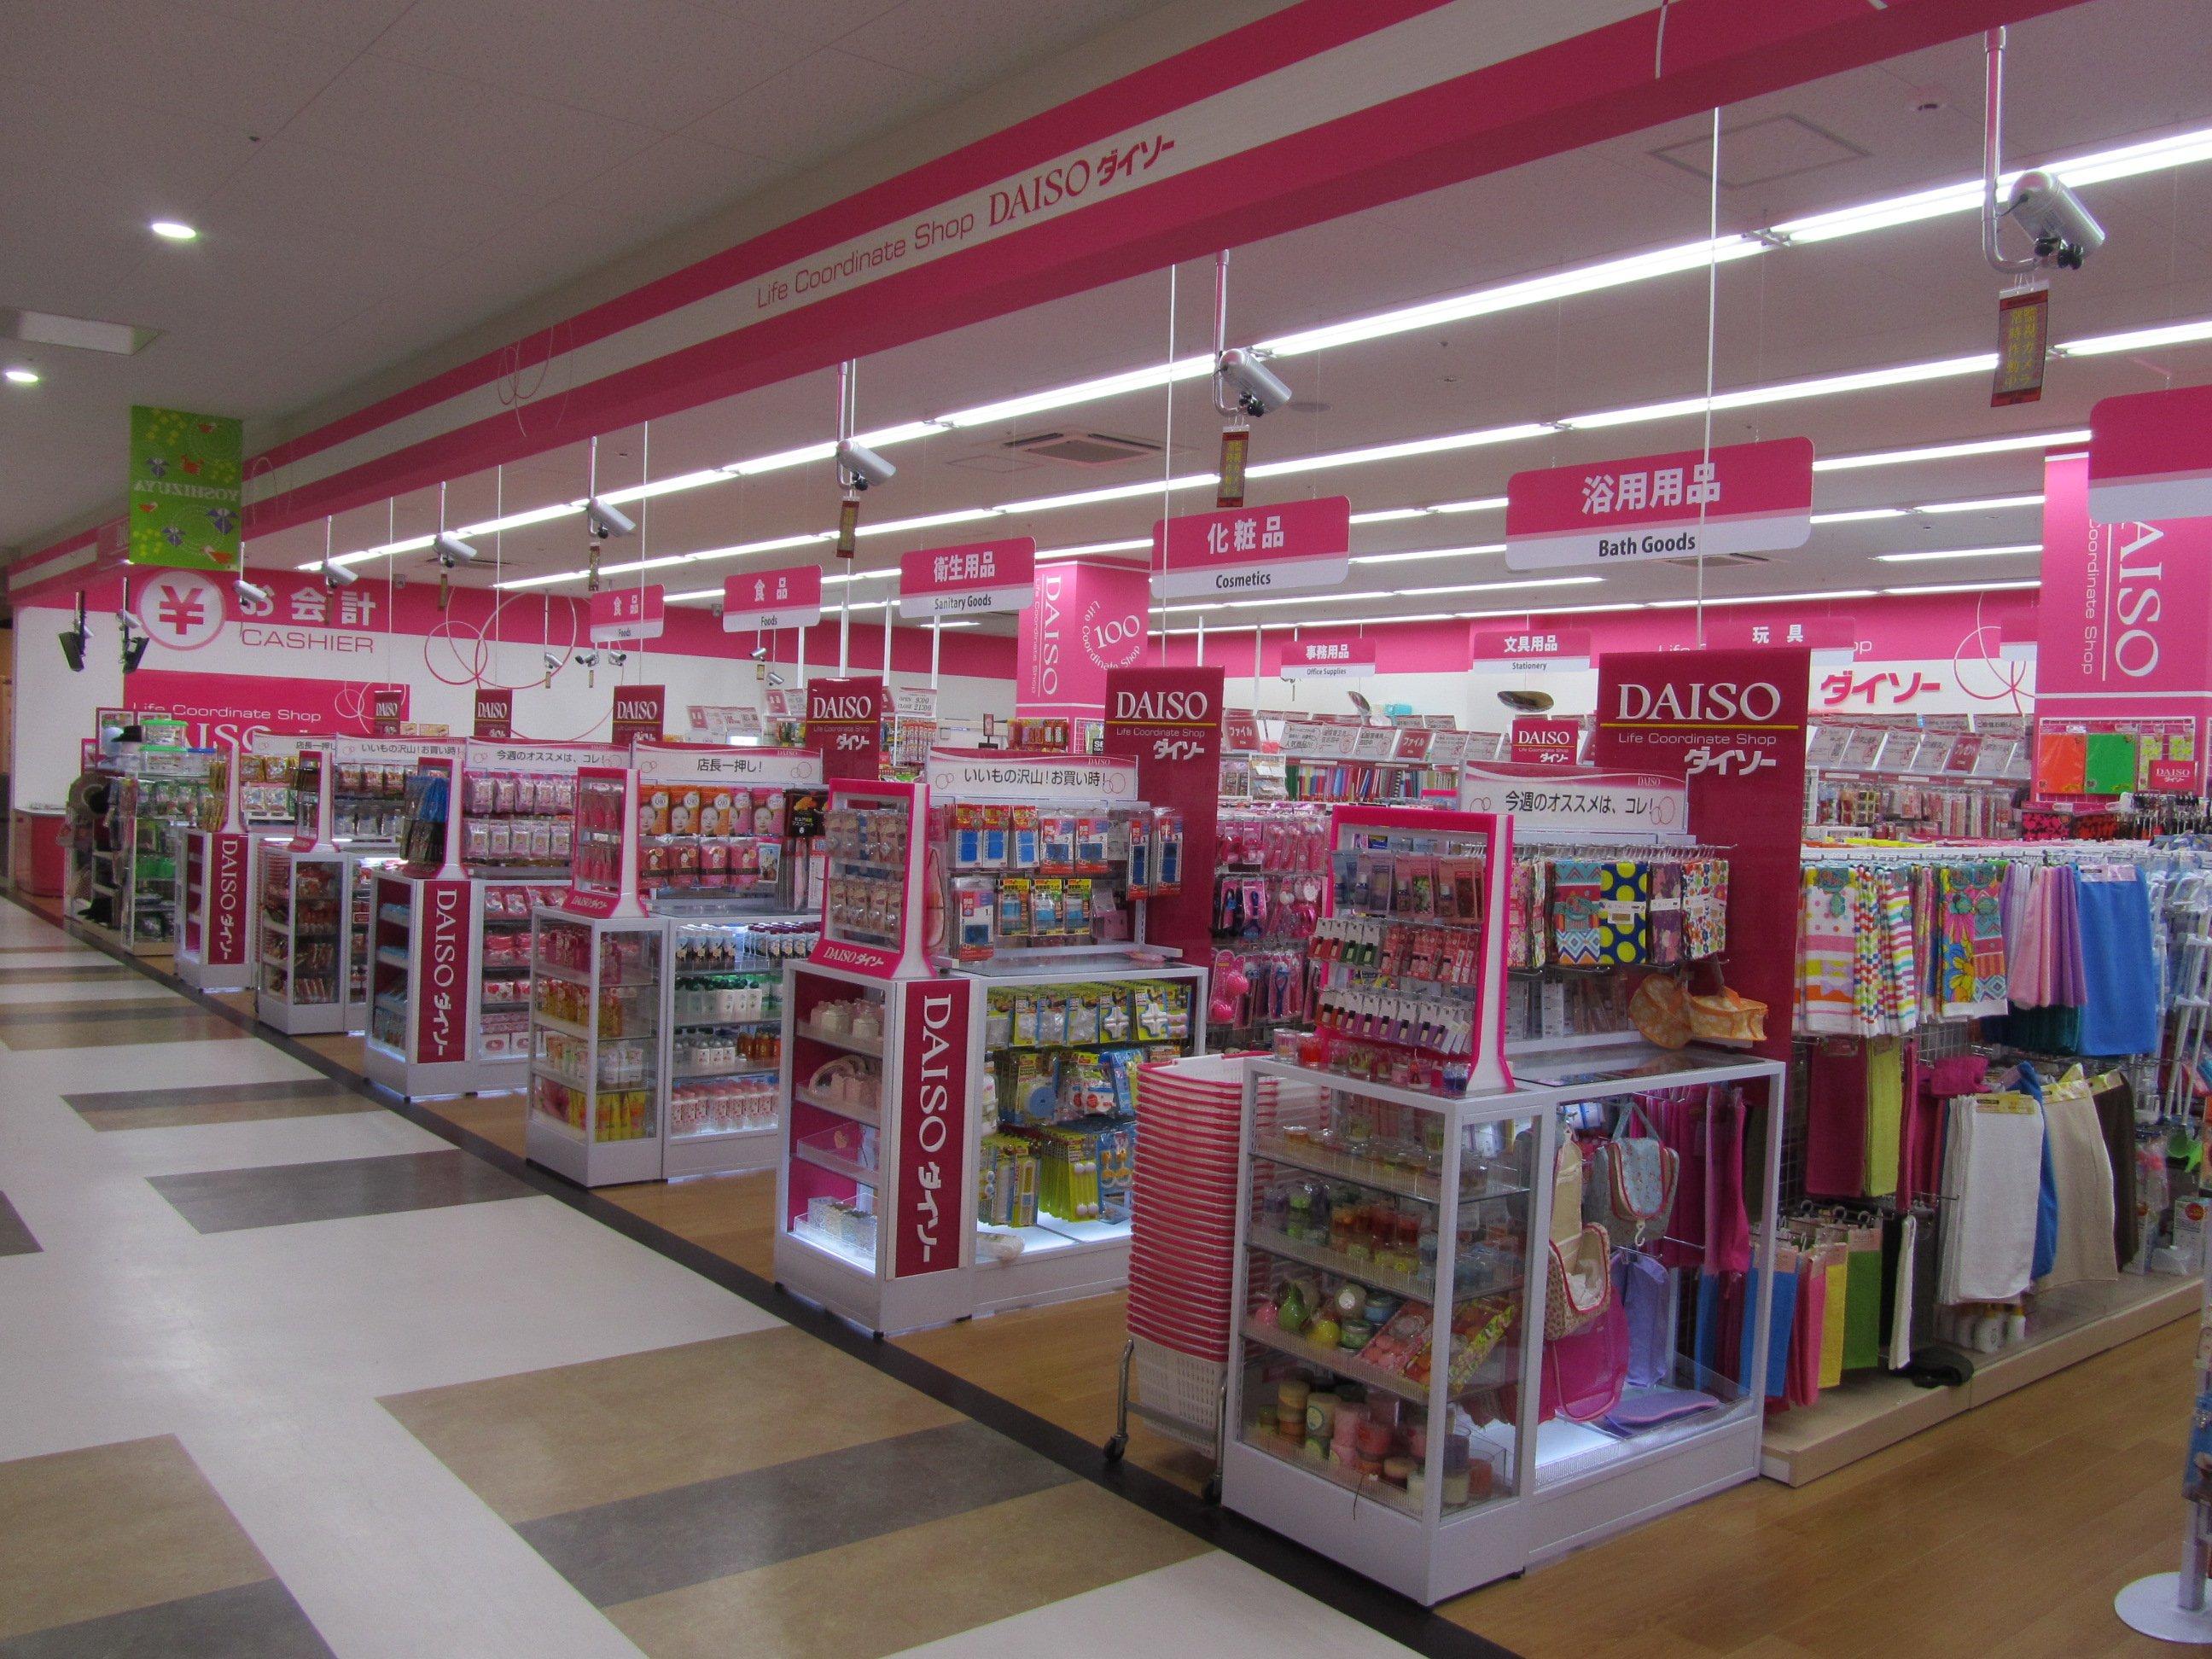 a114c0cd720e6a5a1154fba23cc22487.jpg?resize=1200,630 - ダイソーの商品一覧を把握して店舗巡りをしよう!